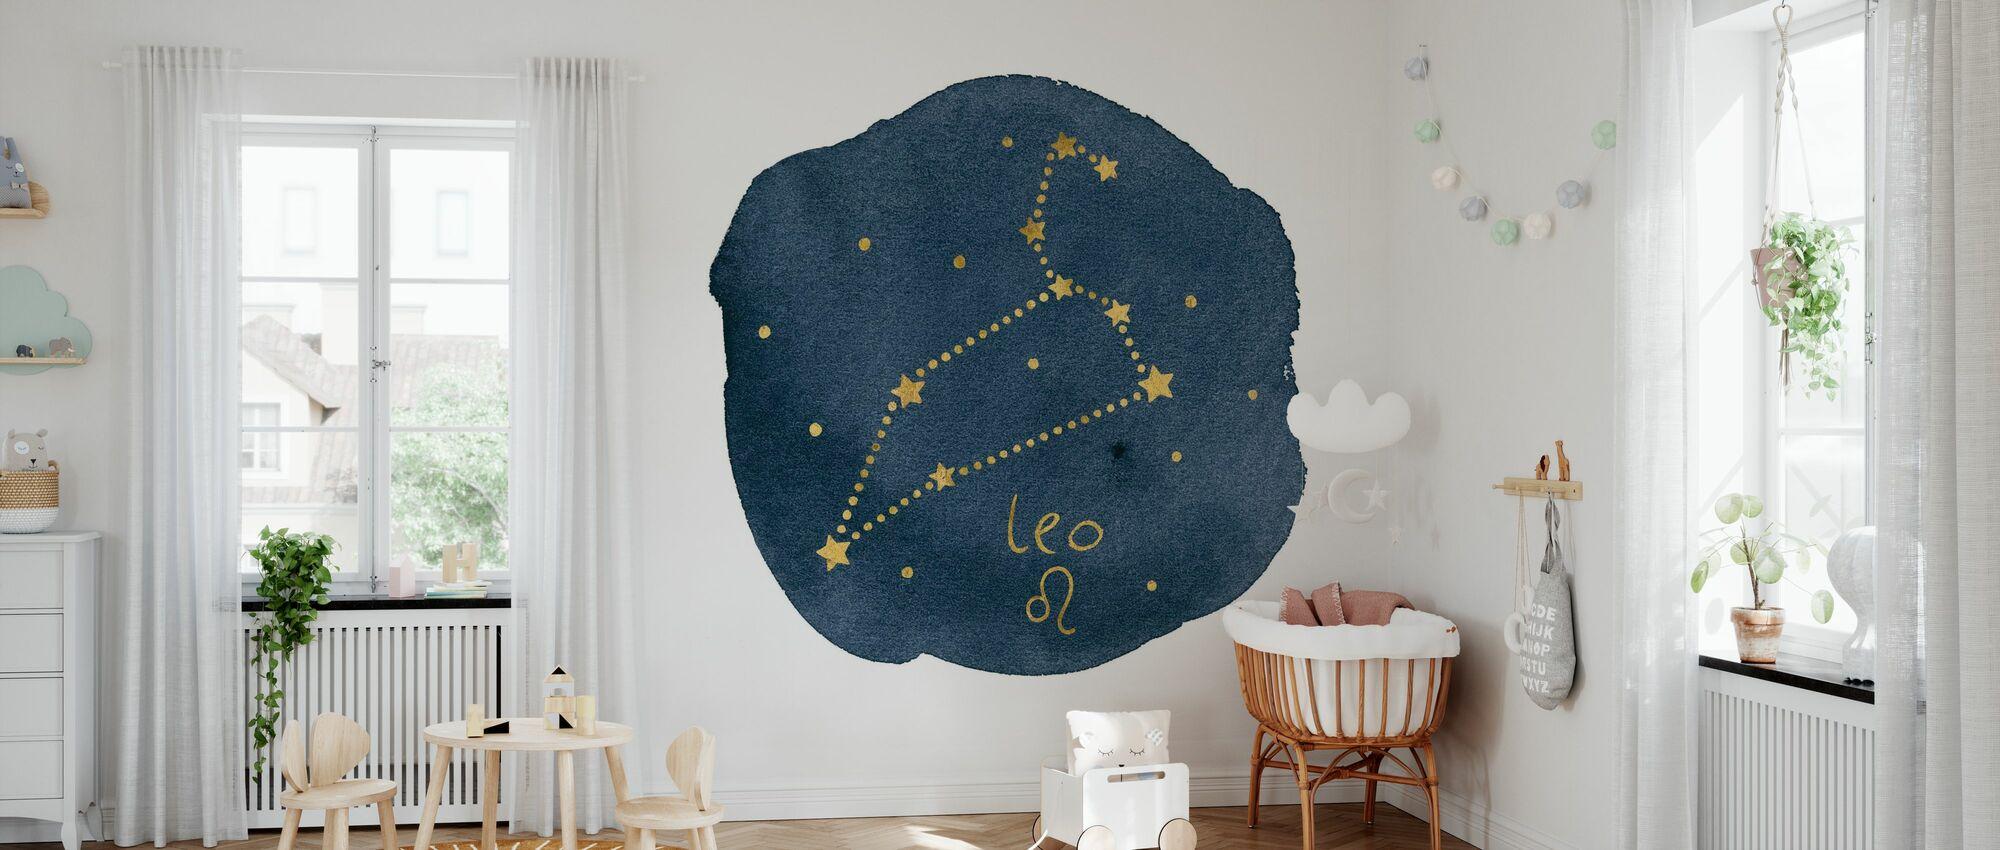 Horoscope Leo - Wallpaper - Nursery